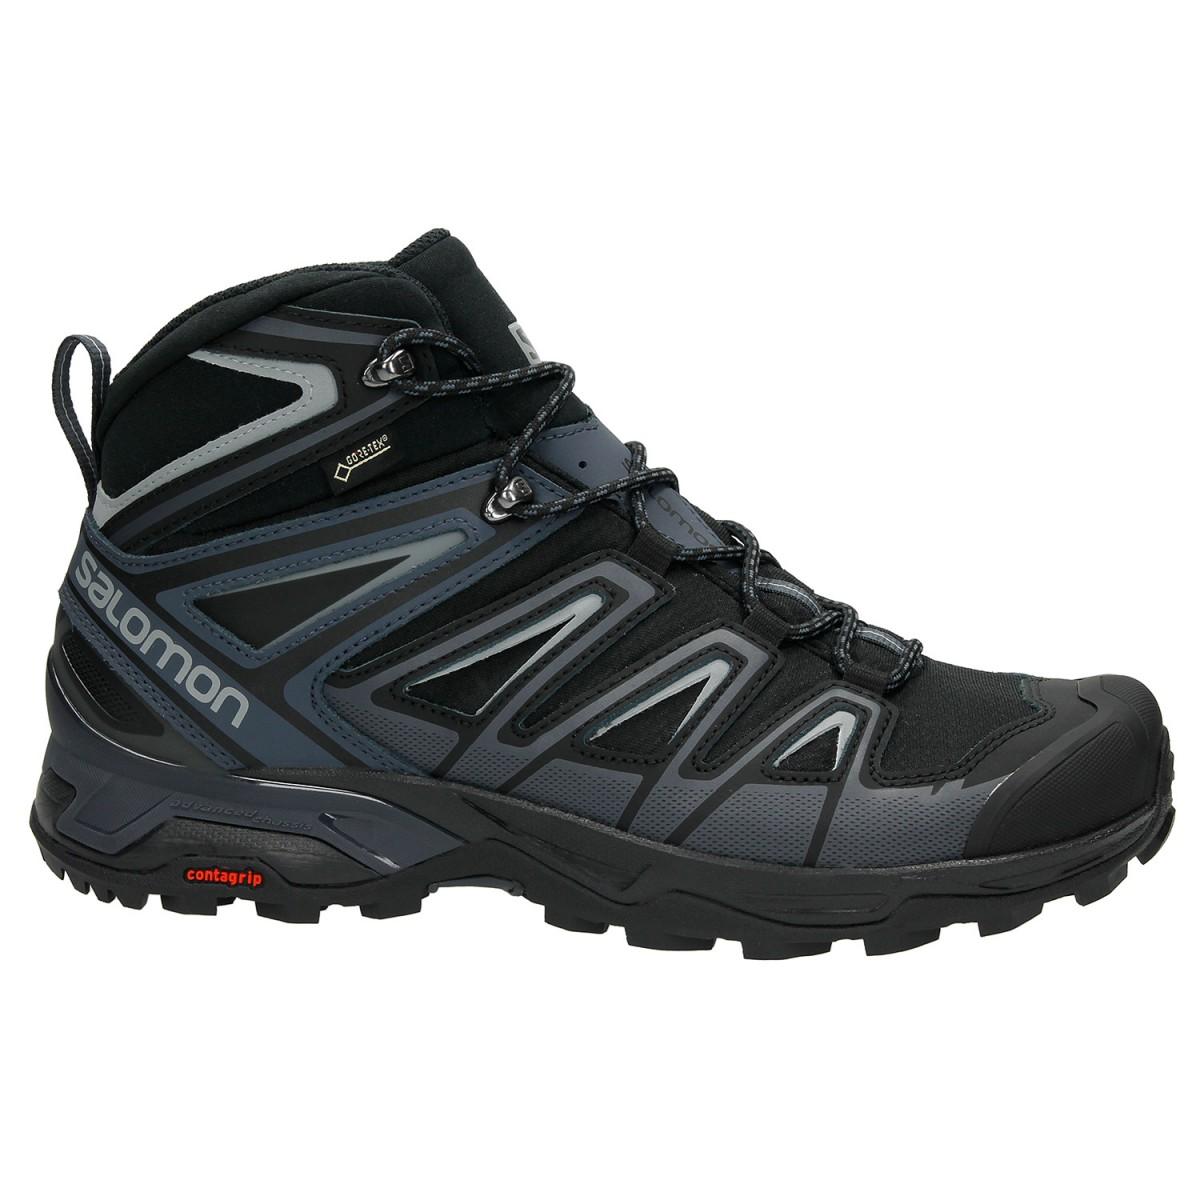 quality design d7330 c76c8 X Ultra Mid Winter Black Scarpe Trekking Unisex